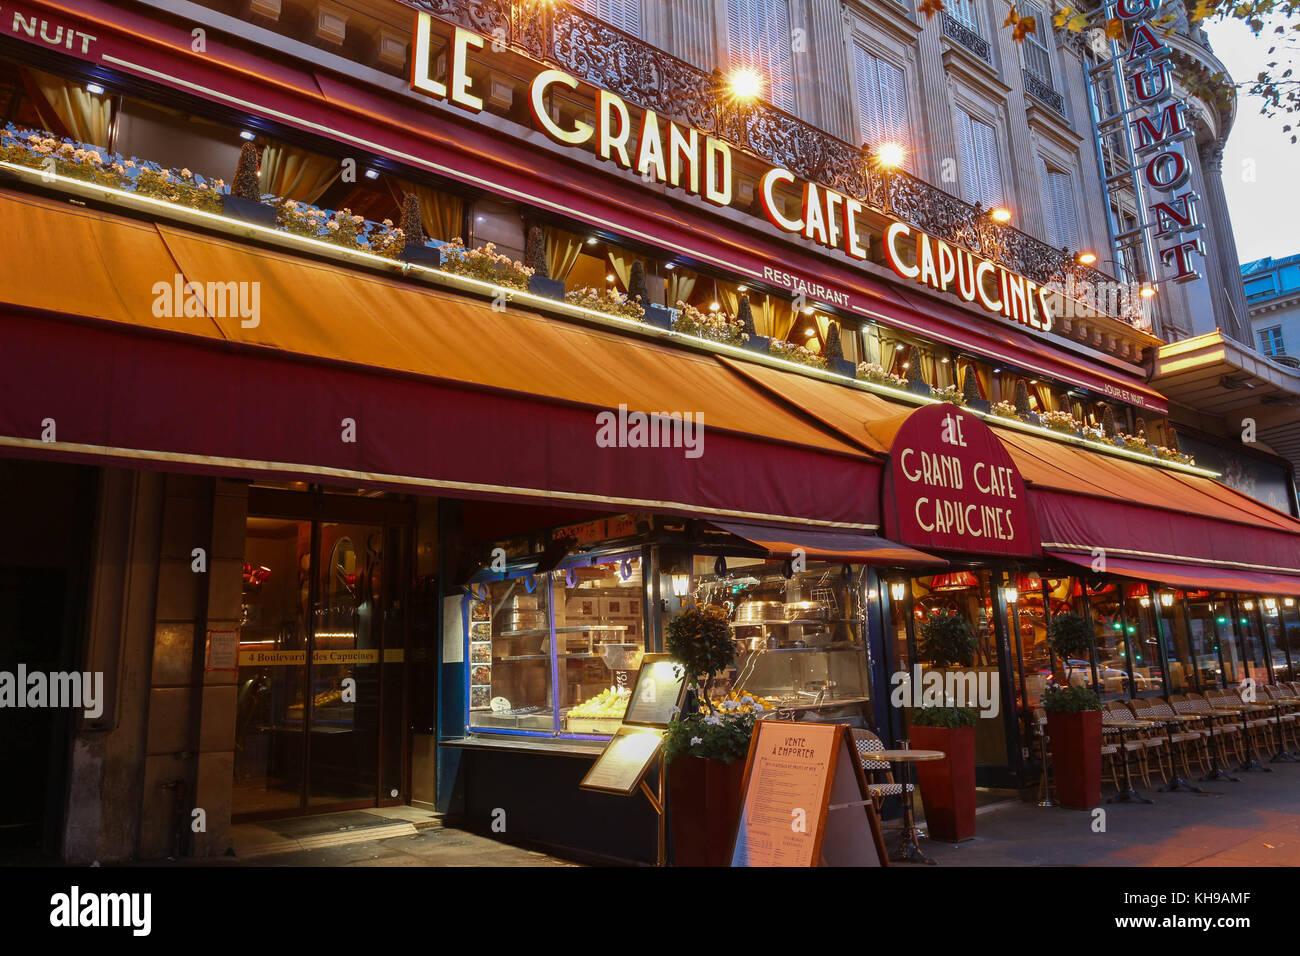 Grand Cafe Capucines Stock Photos & Grand Cafe Capucines Stock ...